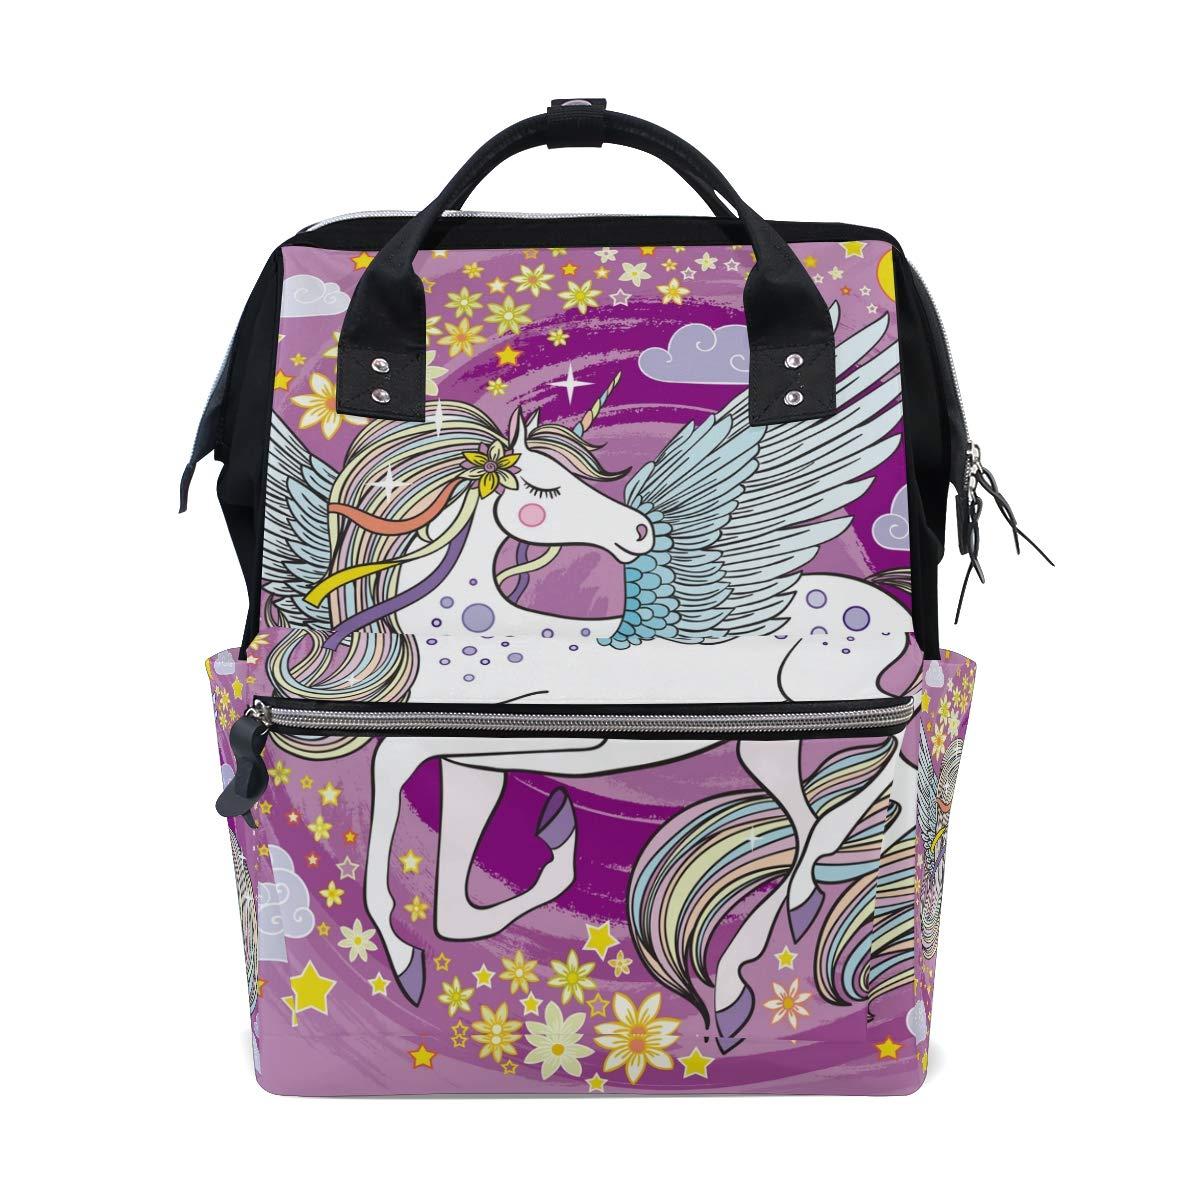 MERRYSUGAR Diaper Bag School Backpack Baby Bag Unicorn Star Purple Large Multifunction Travel Bag Mommy Bag